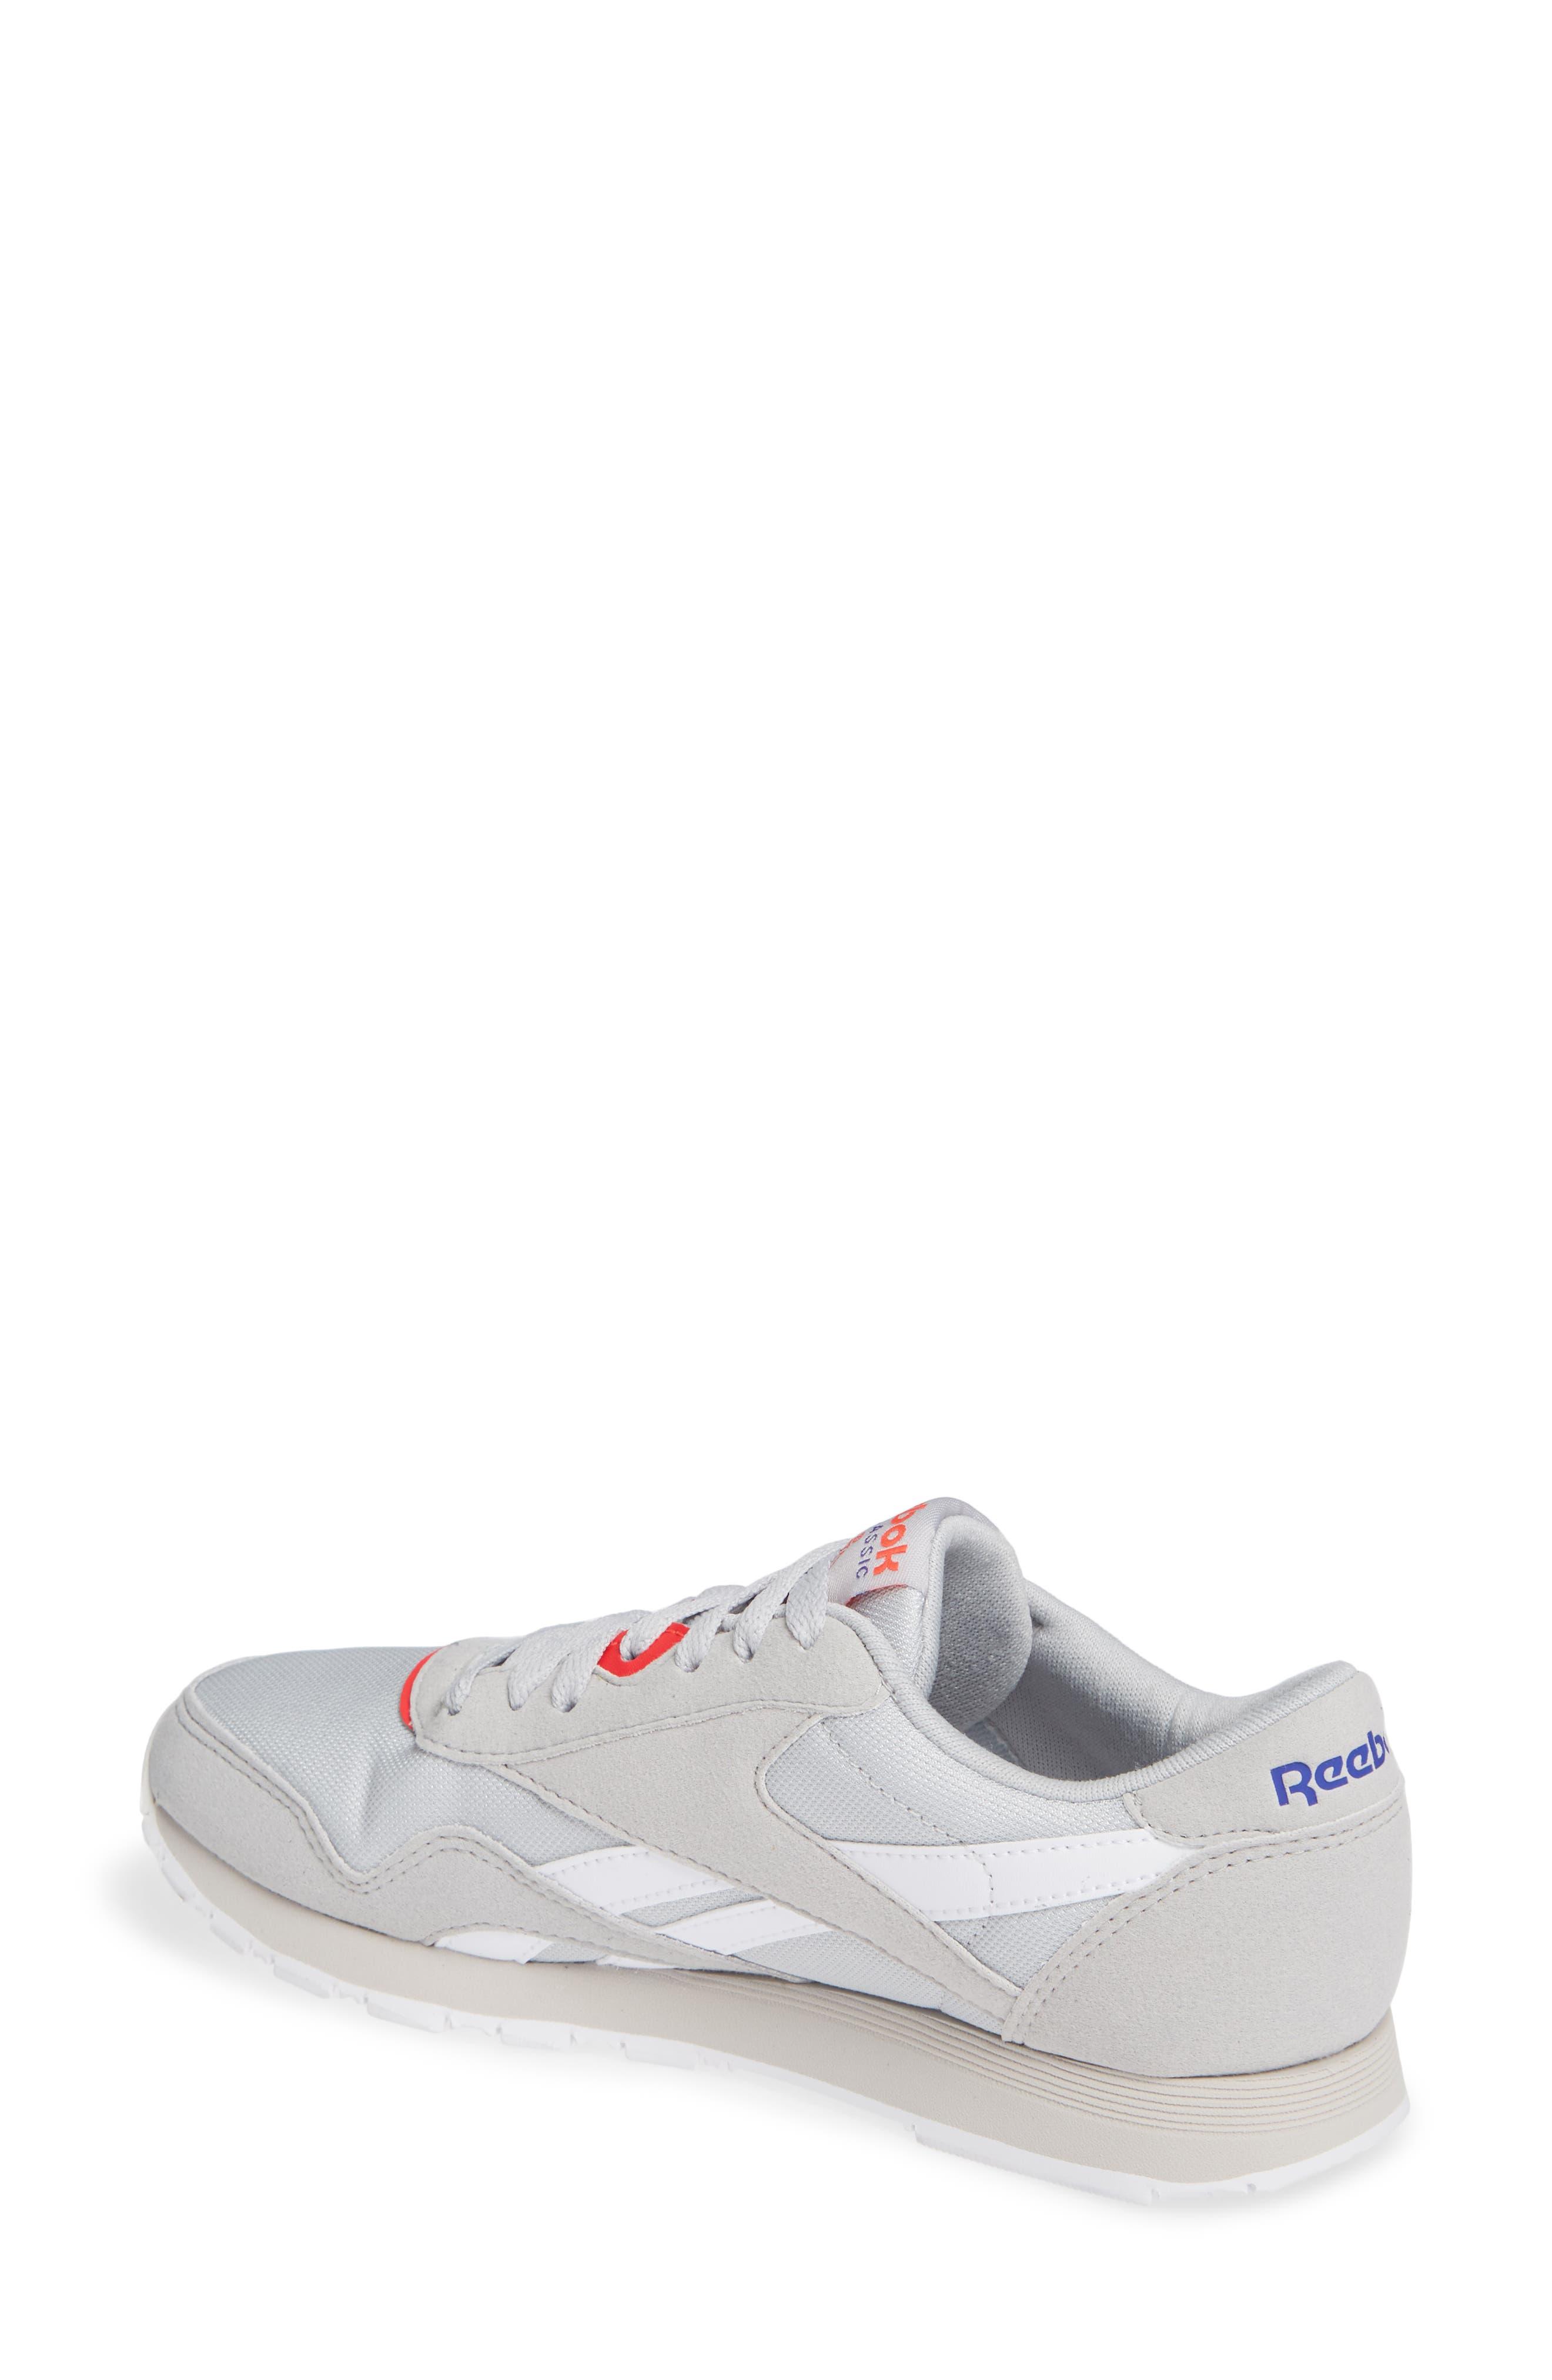 Classic Nylon TXT Sneaker,                             Alternate thumbnail 2, color,                             GREY/ NEON CHERRY/ PURPLE